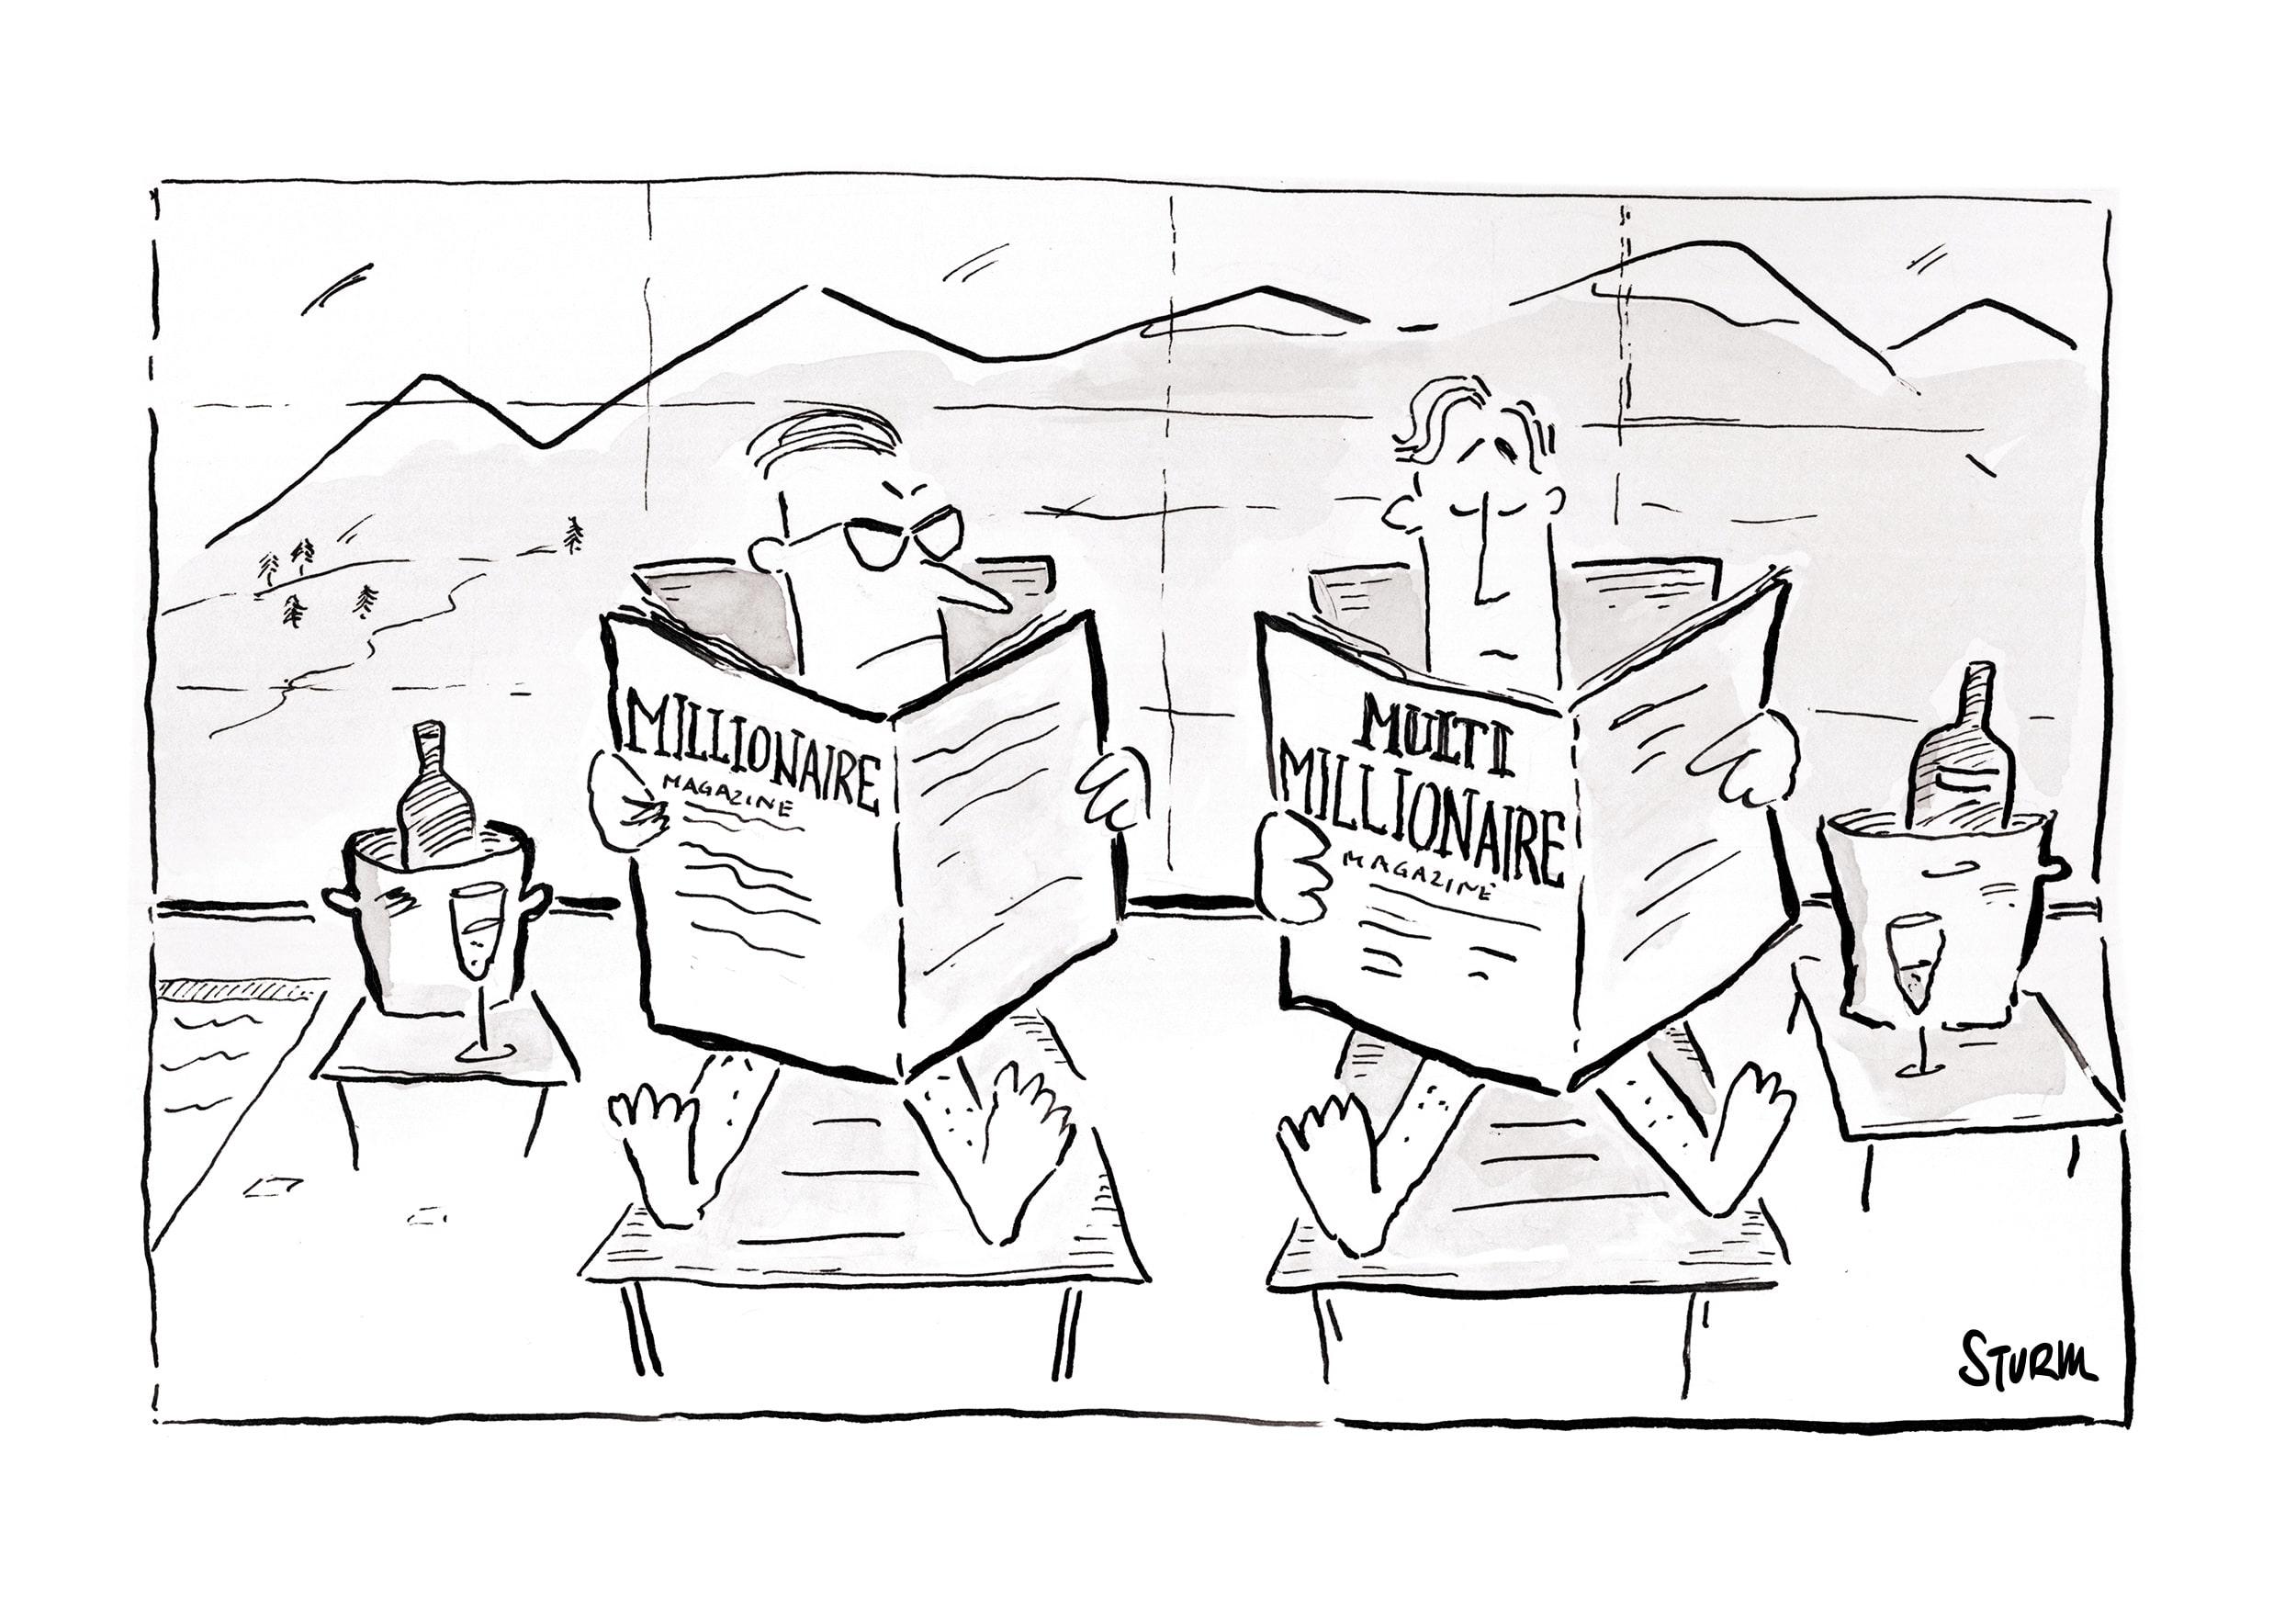 millionaire vs multimillionaire. Cartoon by Philipp Sturm.